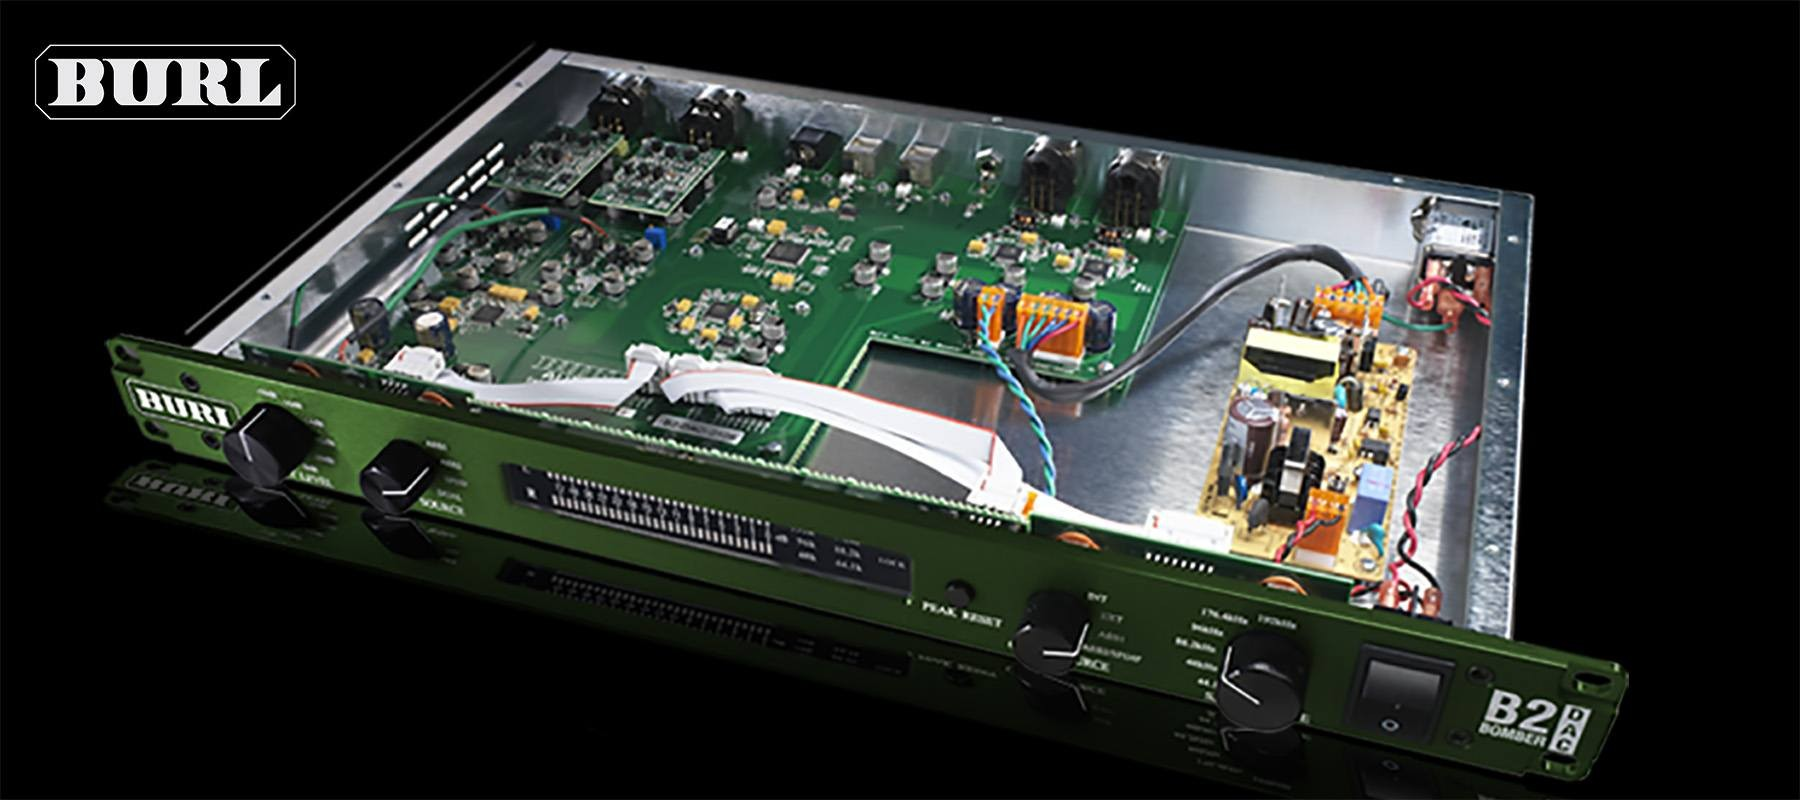 Burl Audio B2 Bomber DAC Ouvert